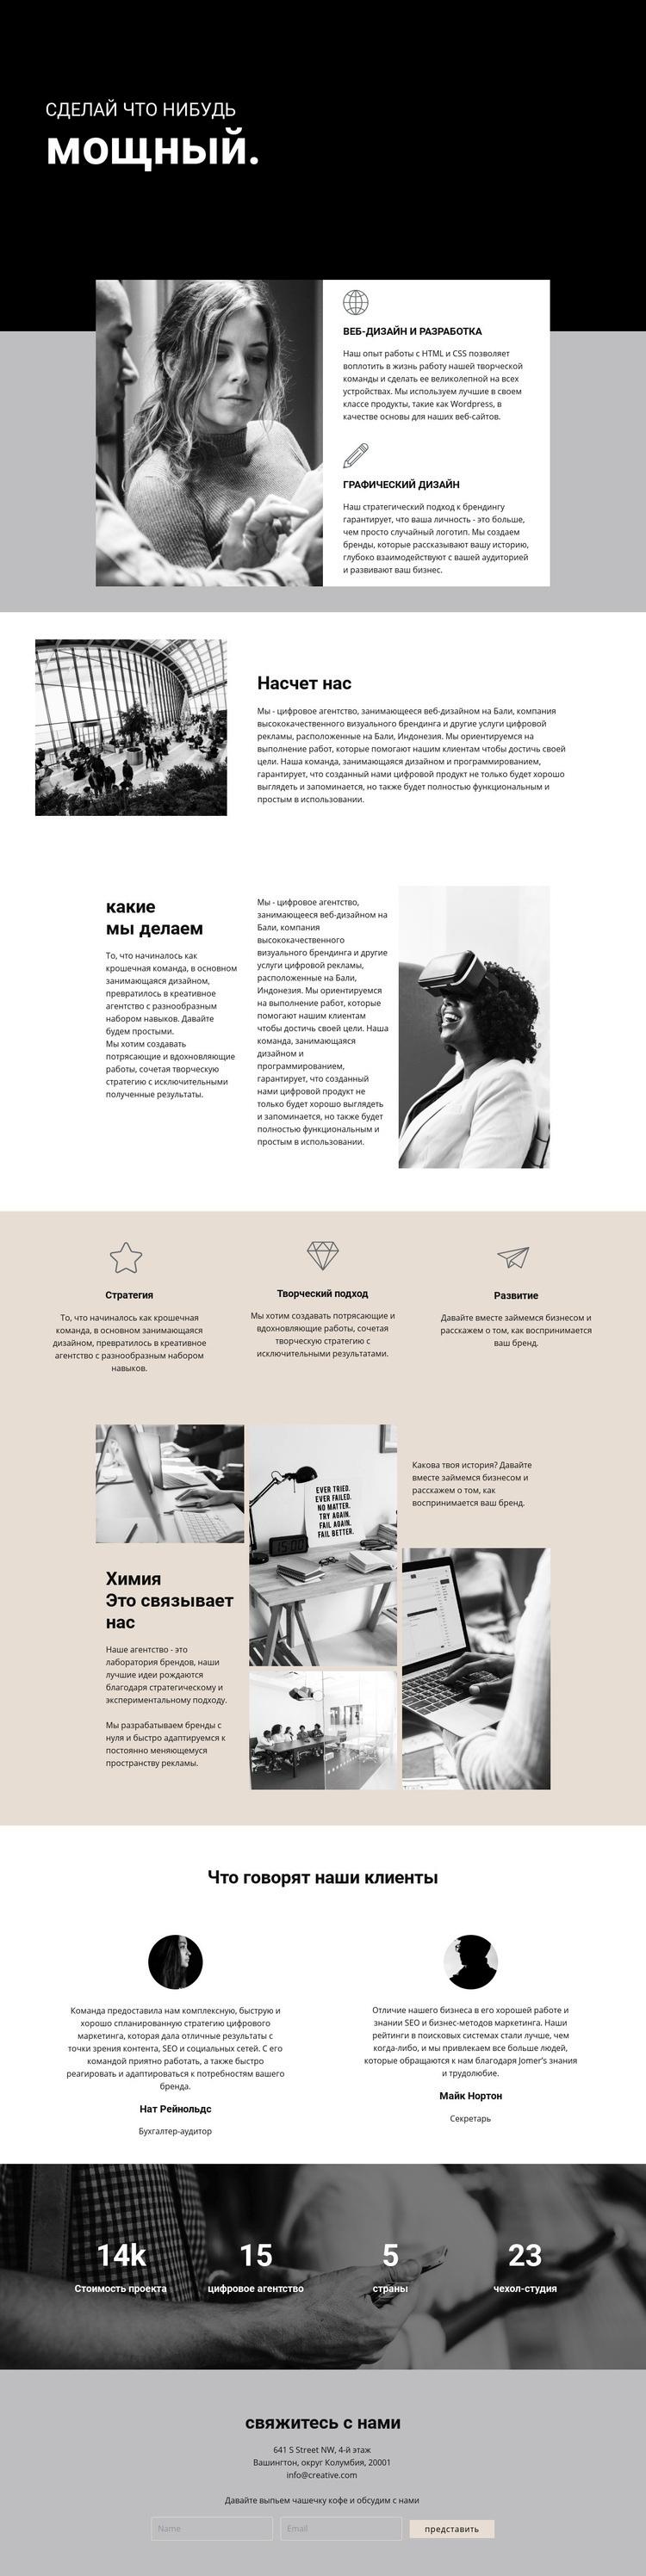 Сила цифрового бизнеса Шаблон веб-сайта